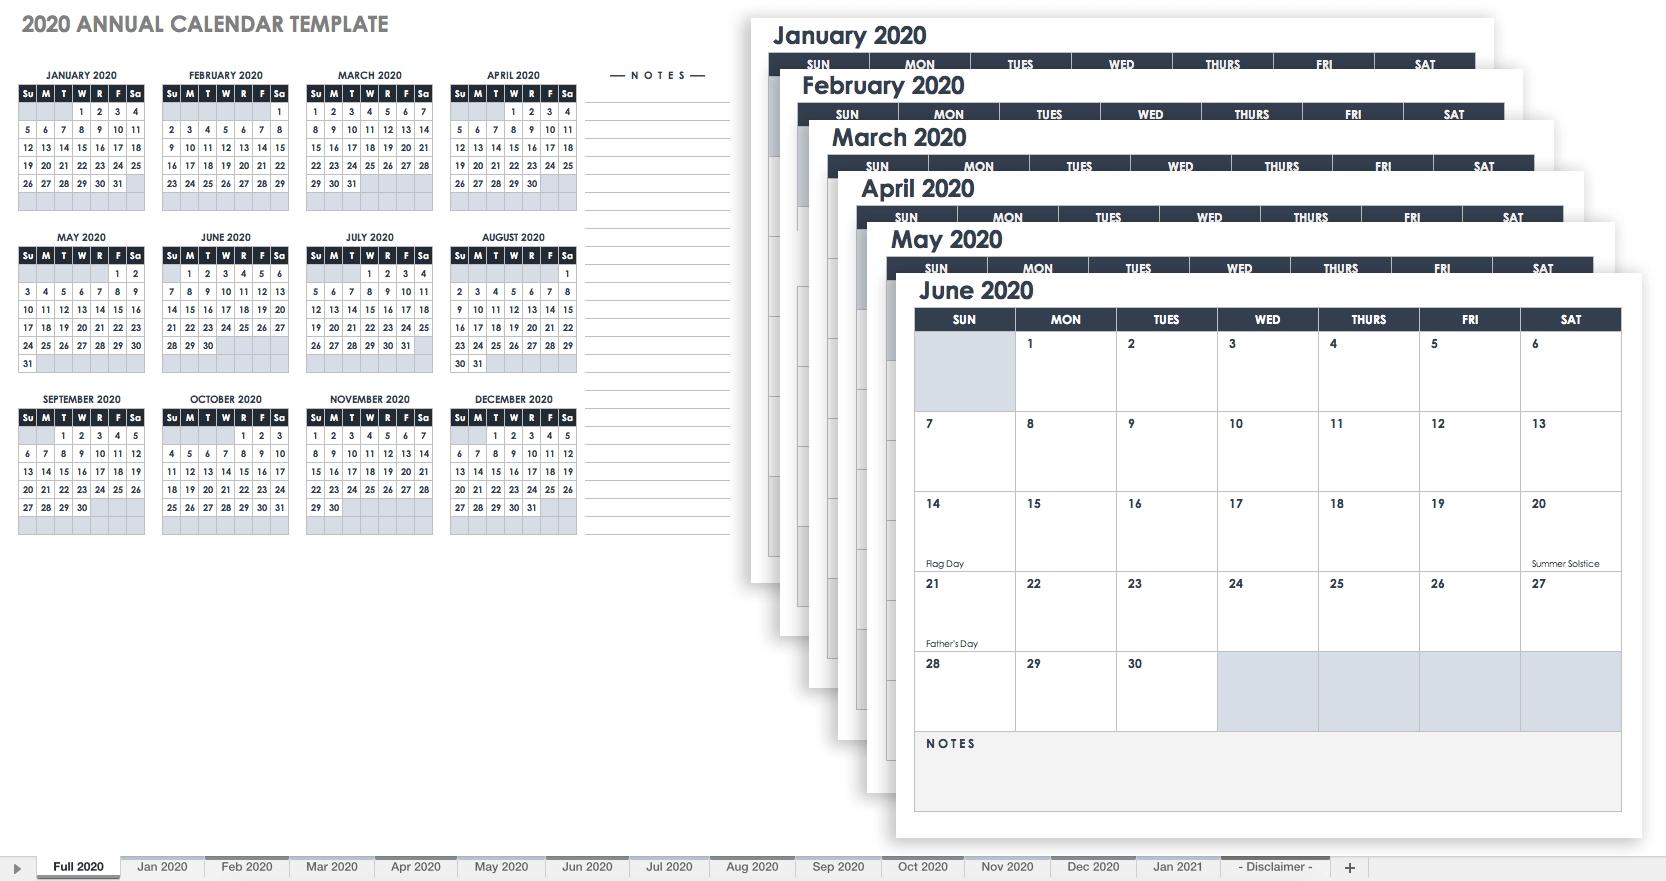 Free Blank Calendar Templates - Smartsheet-Create 2020 - 2021 Blank Monthly Calendar